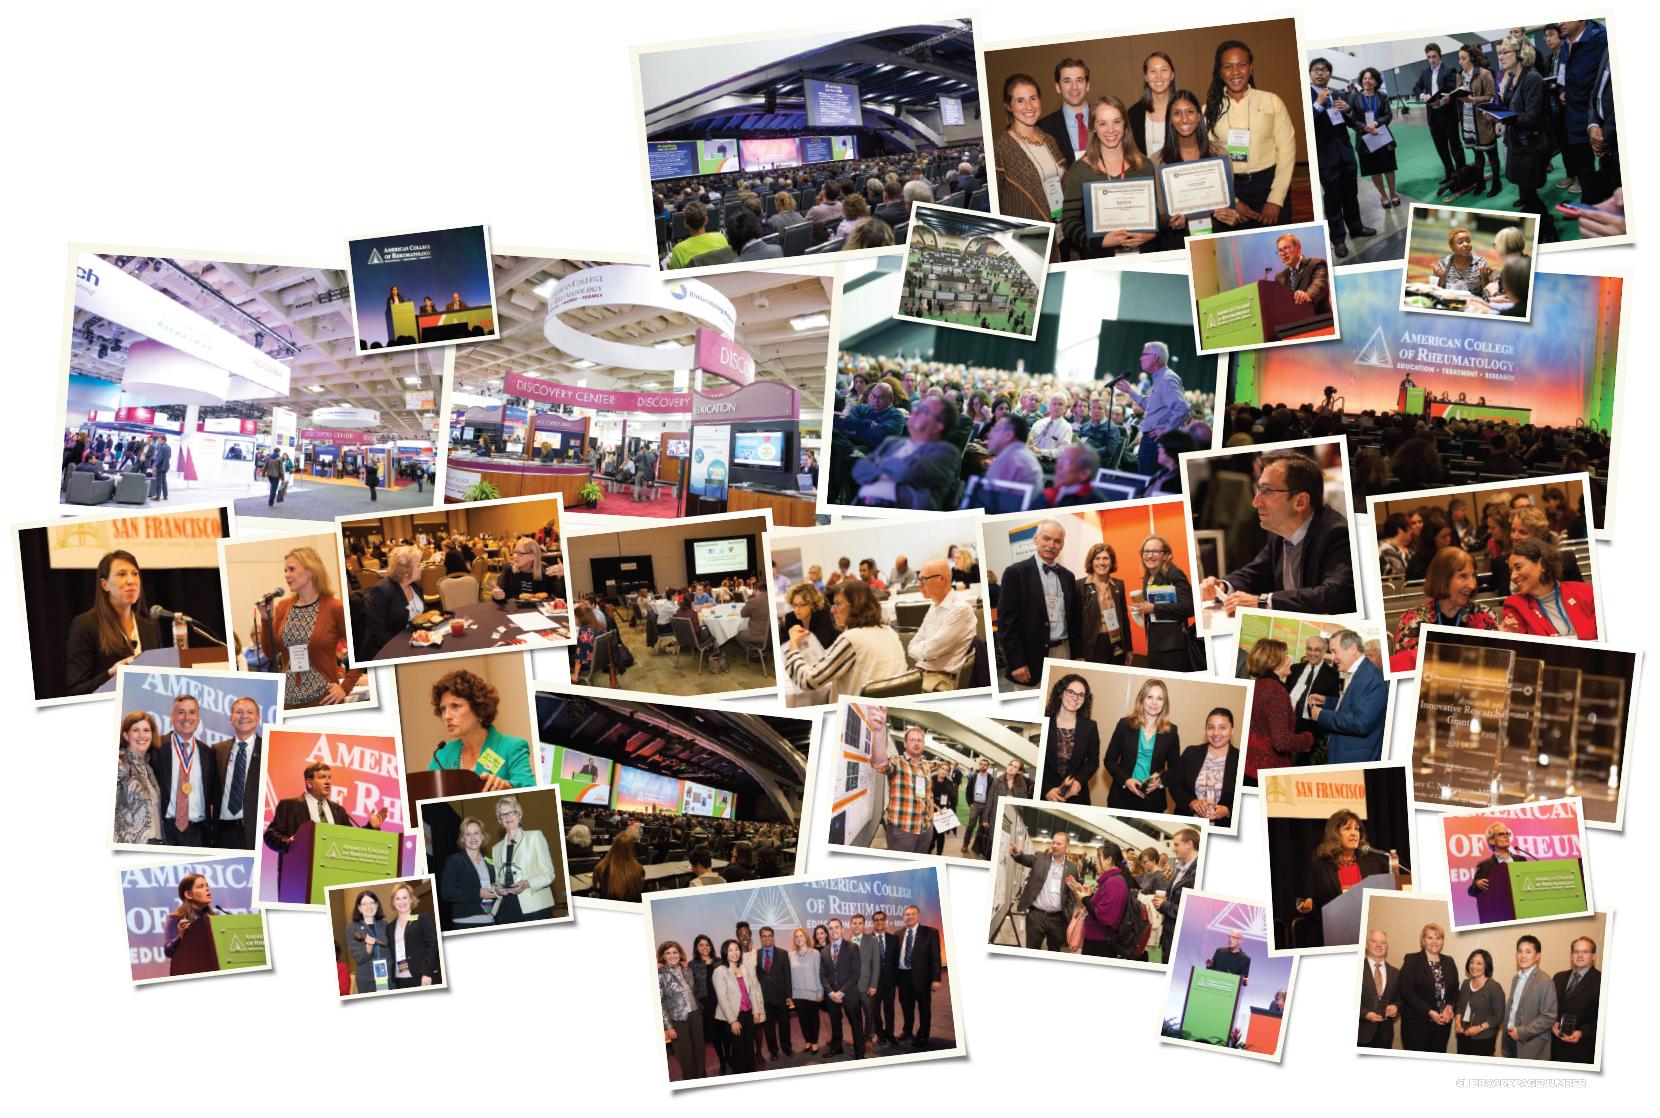 2015 ACR/ARHP Annual Meeting in Photos - The Rheumatologist